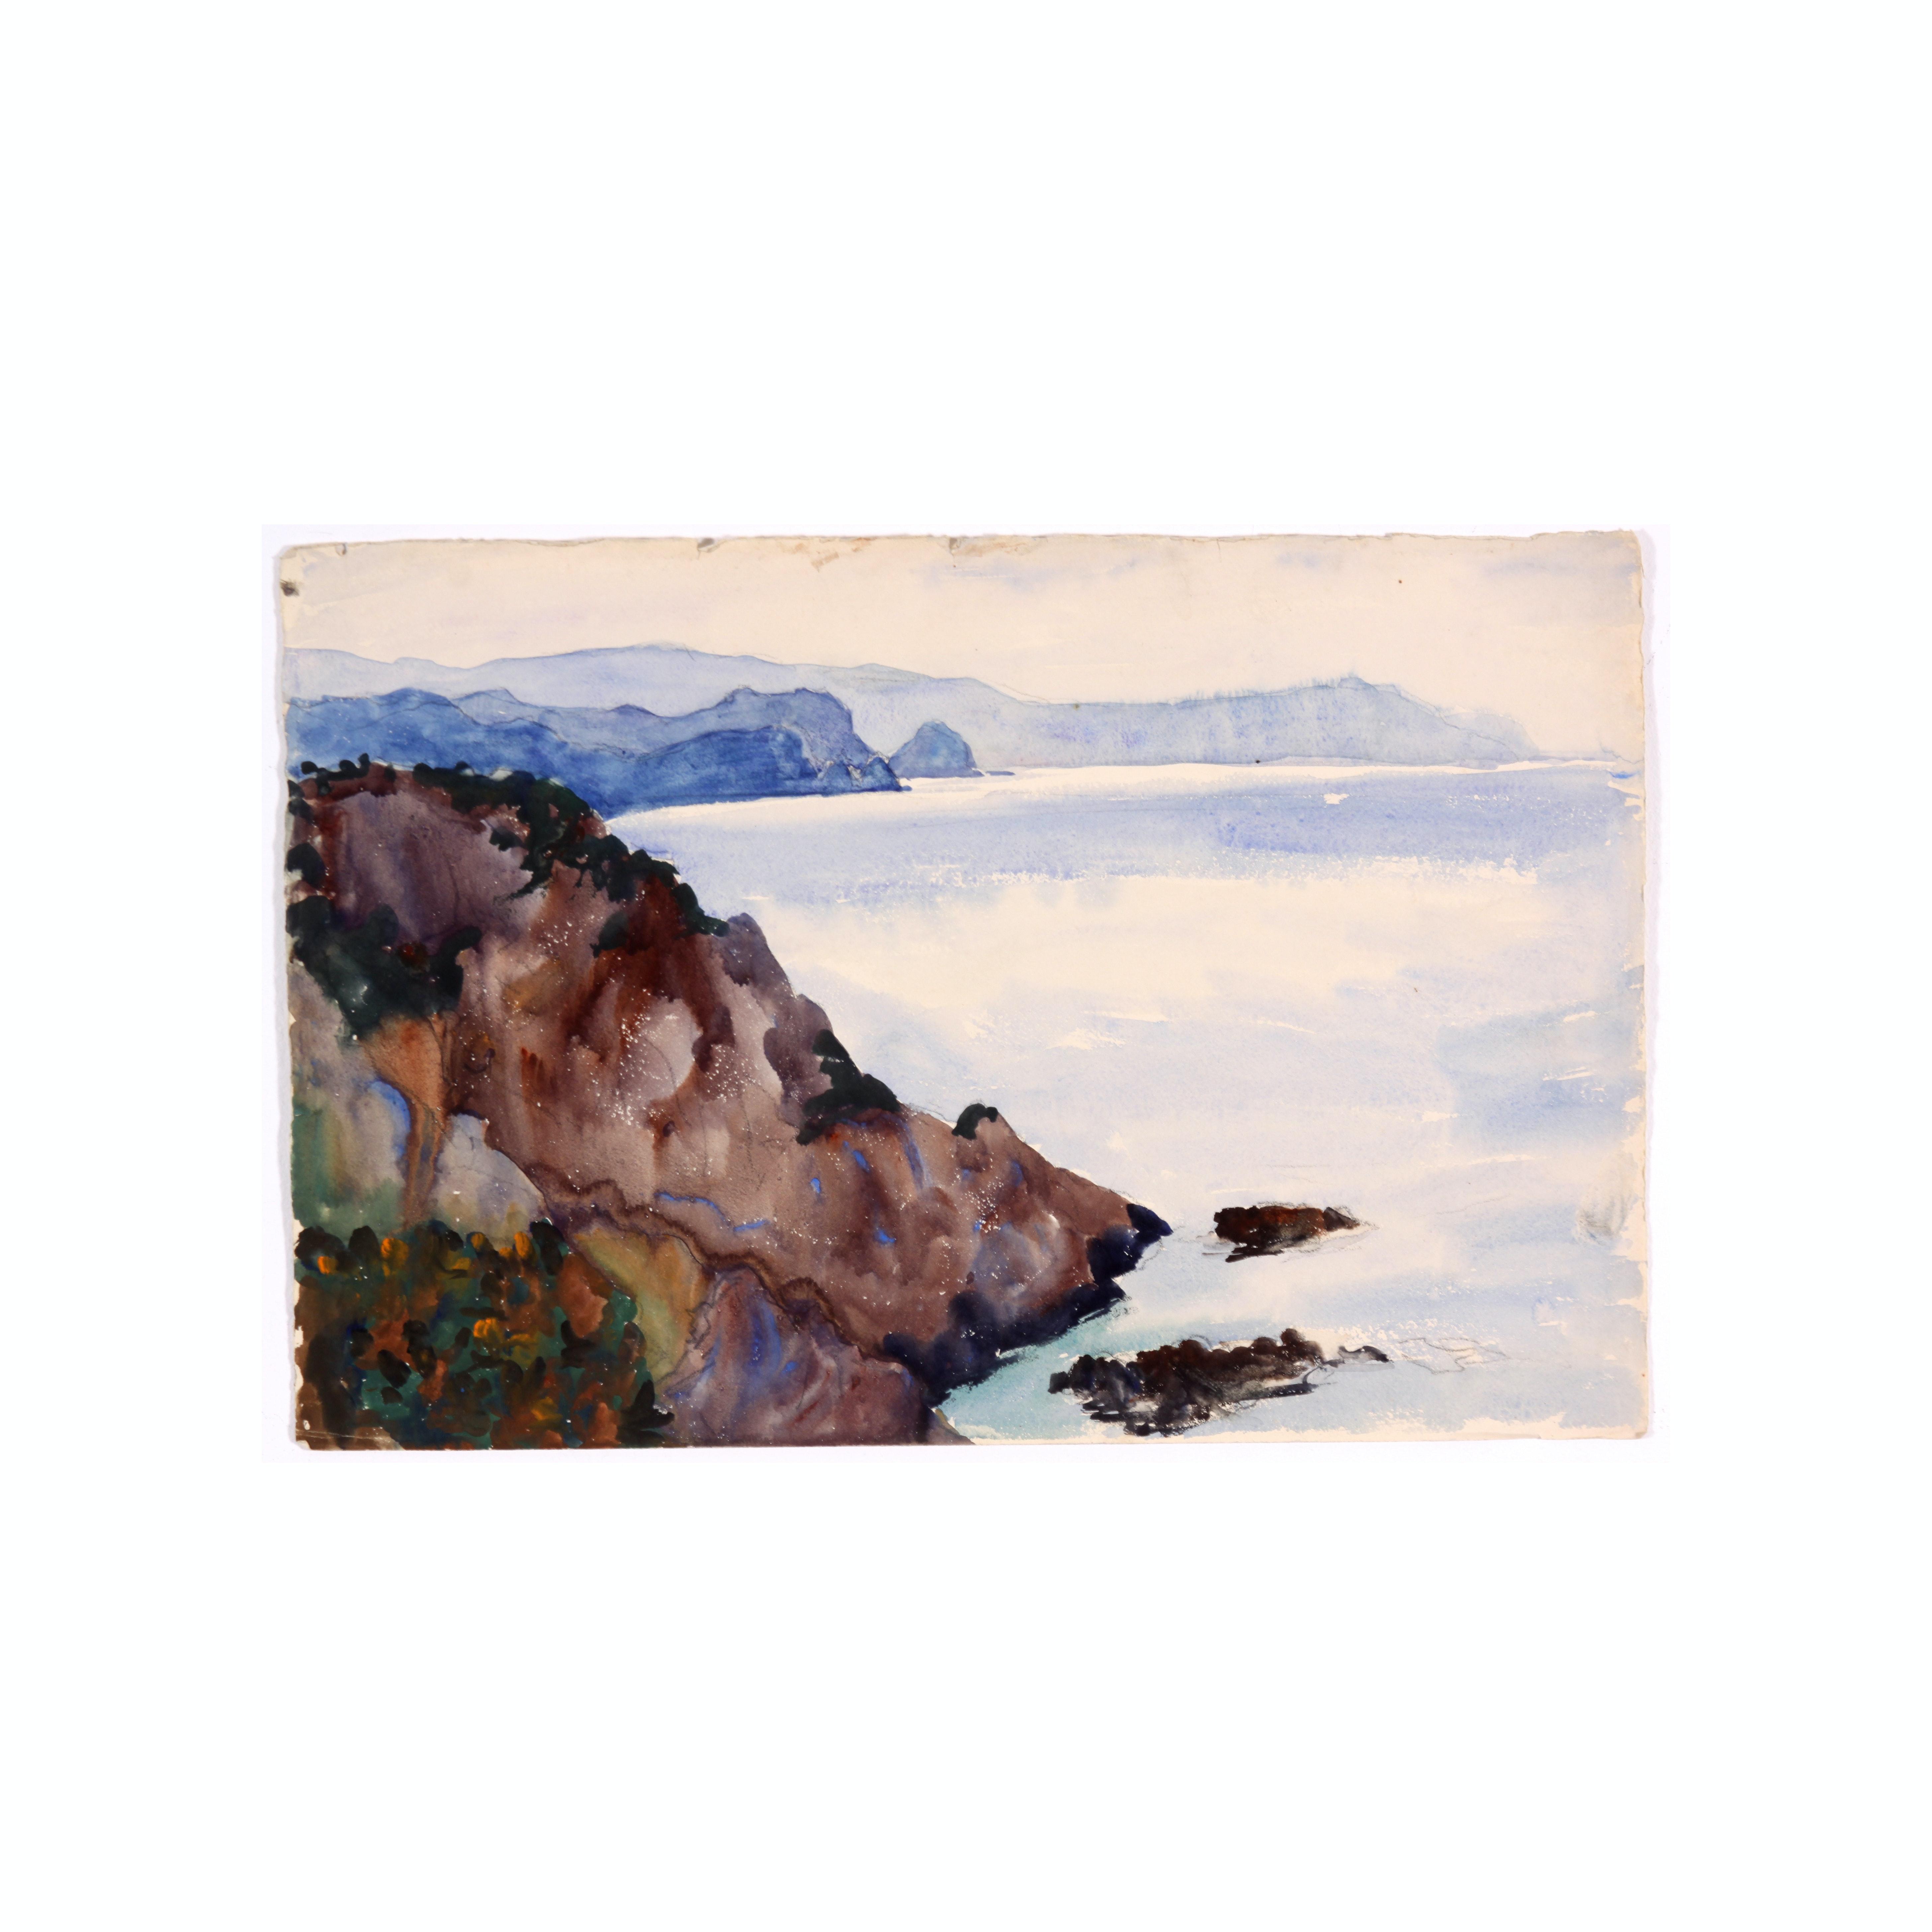 Colonel Raoul Monory c. 1930s Watercolor of a Mediterranean Seashore